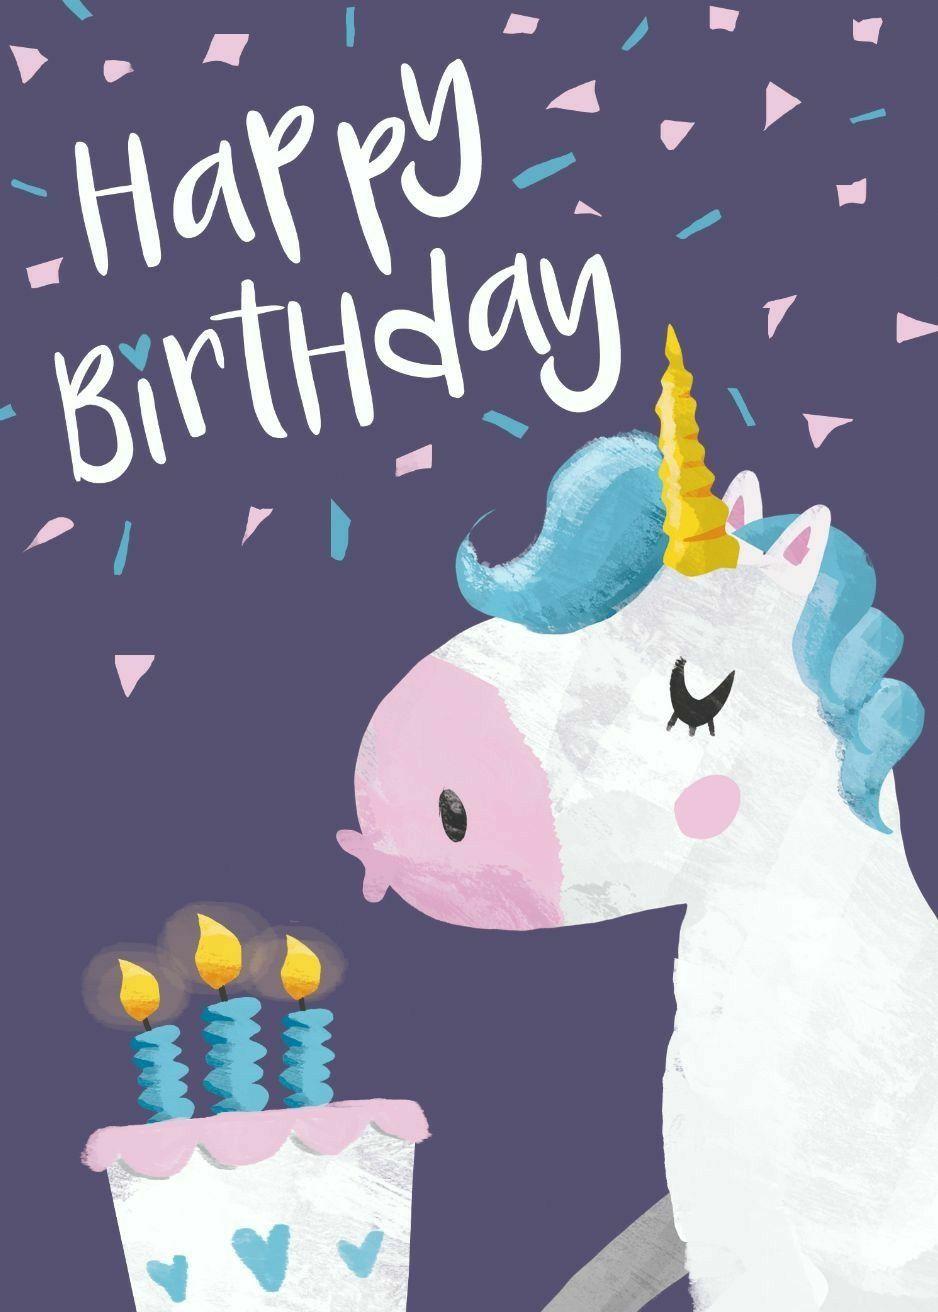 Unicorn birthday cards by Bloss on Happy Birthday